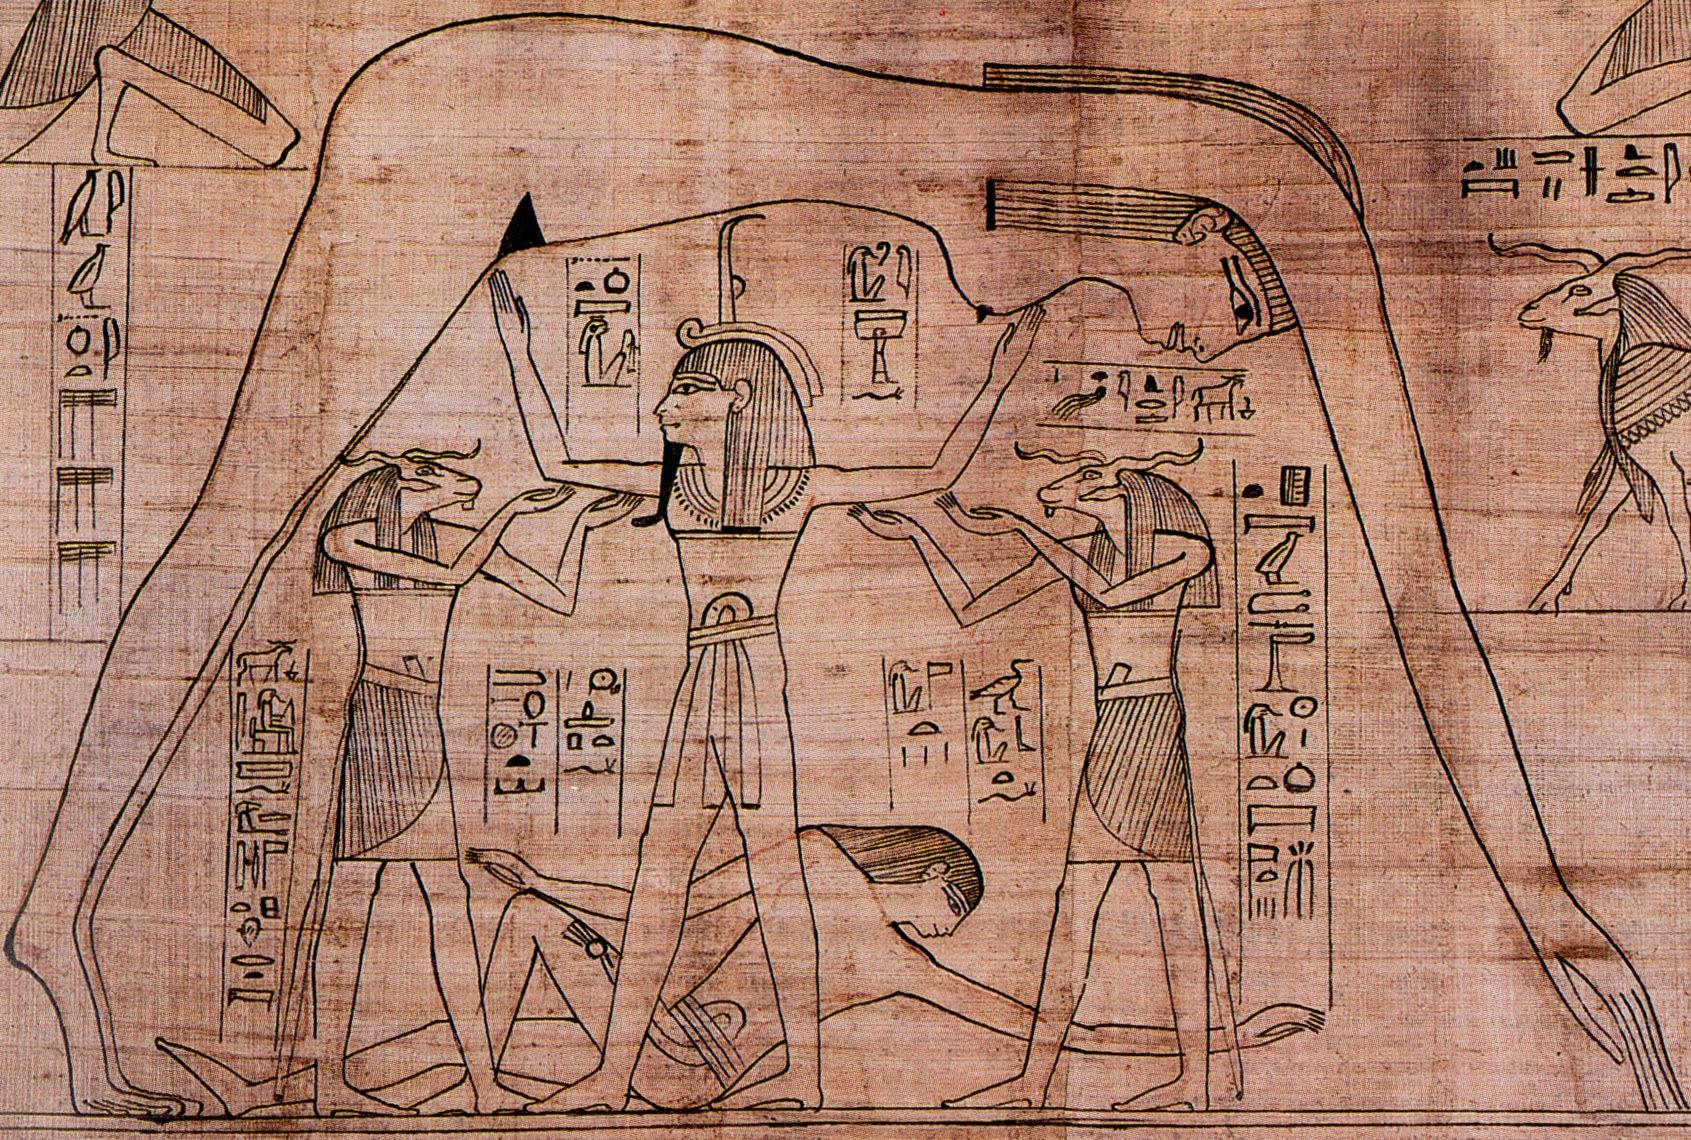 Traveling Templar Symbols Of Royal Arch Masonry Part 2